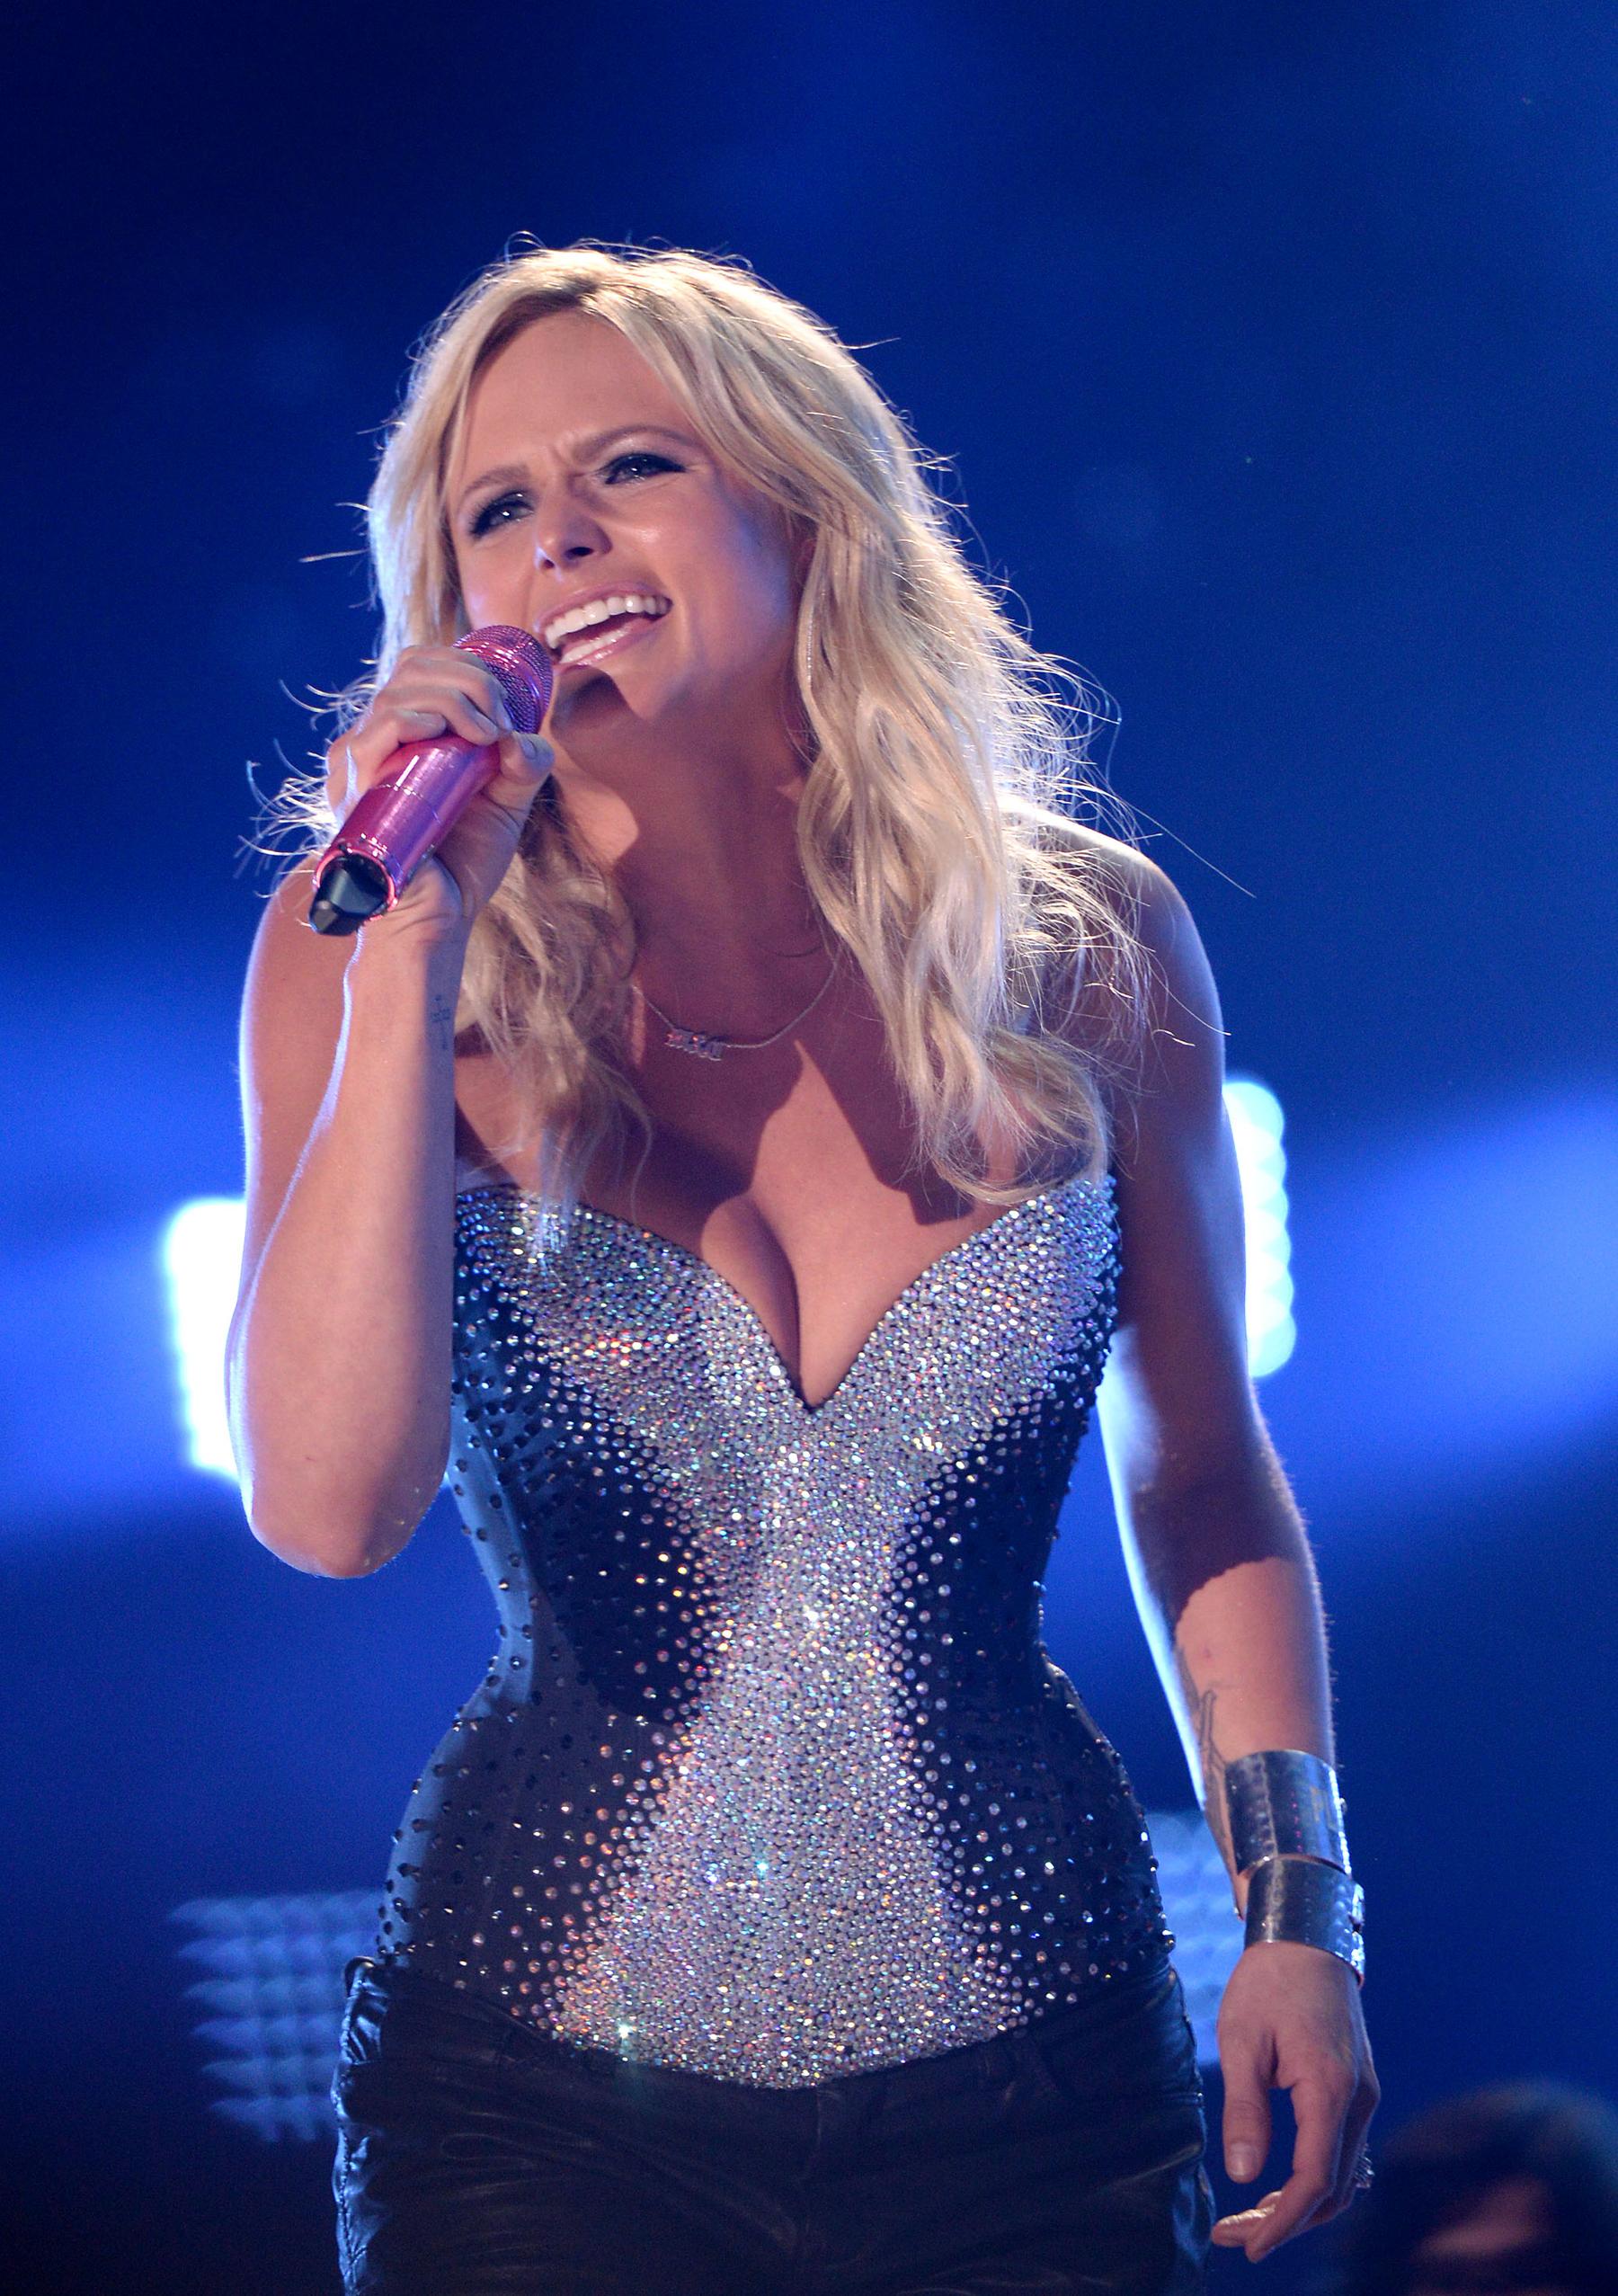 Miranda Lambert's 'Automatic' Number One